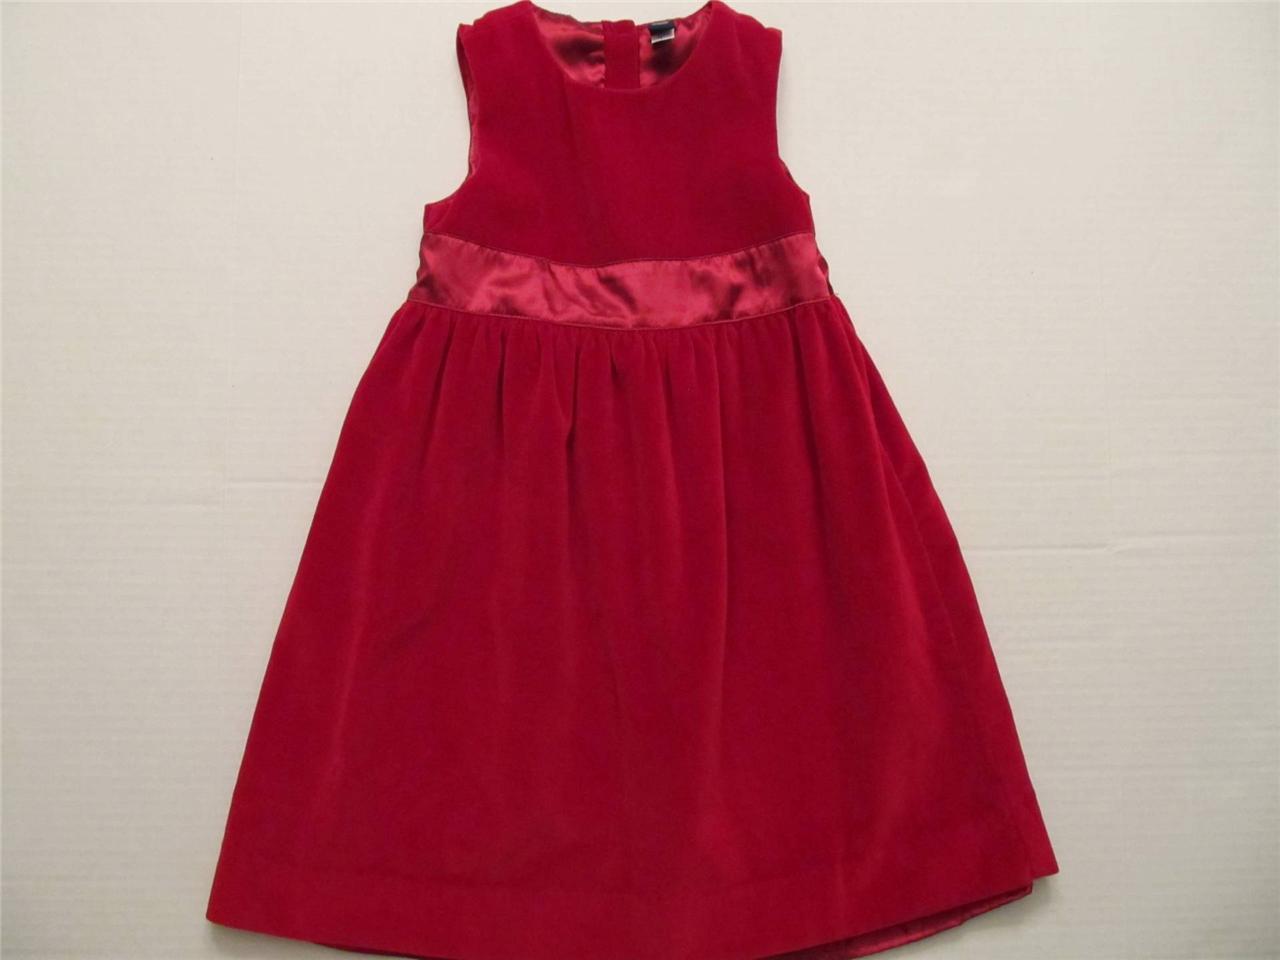 Gap toddler girl size 5 years red velvet holiday jumper dress classic